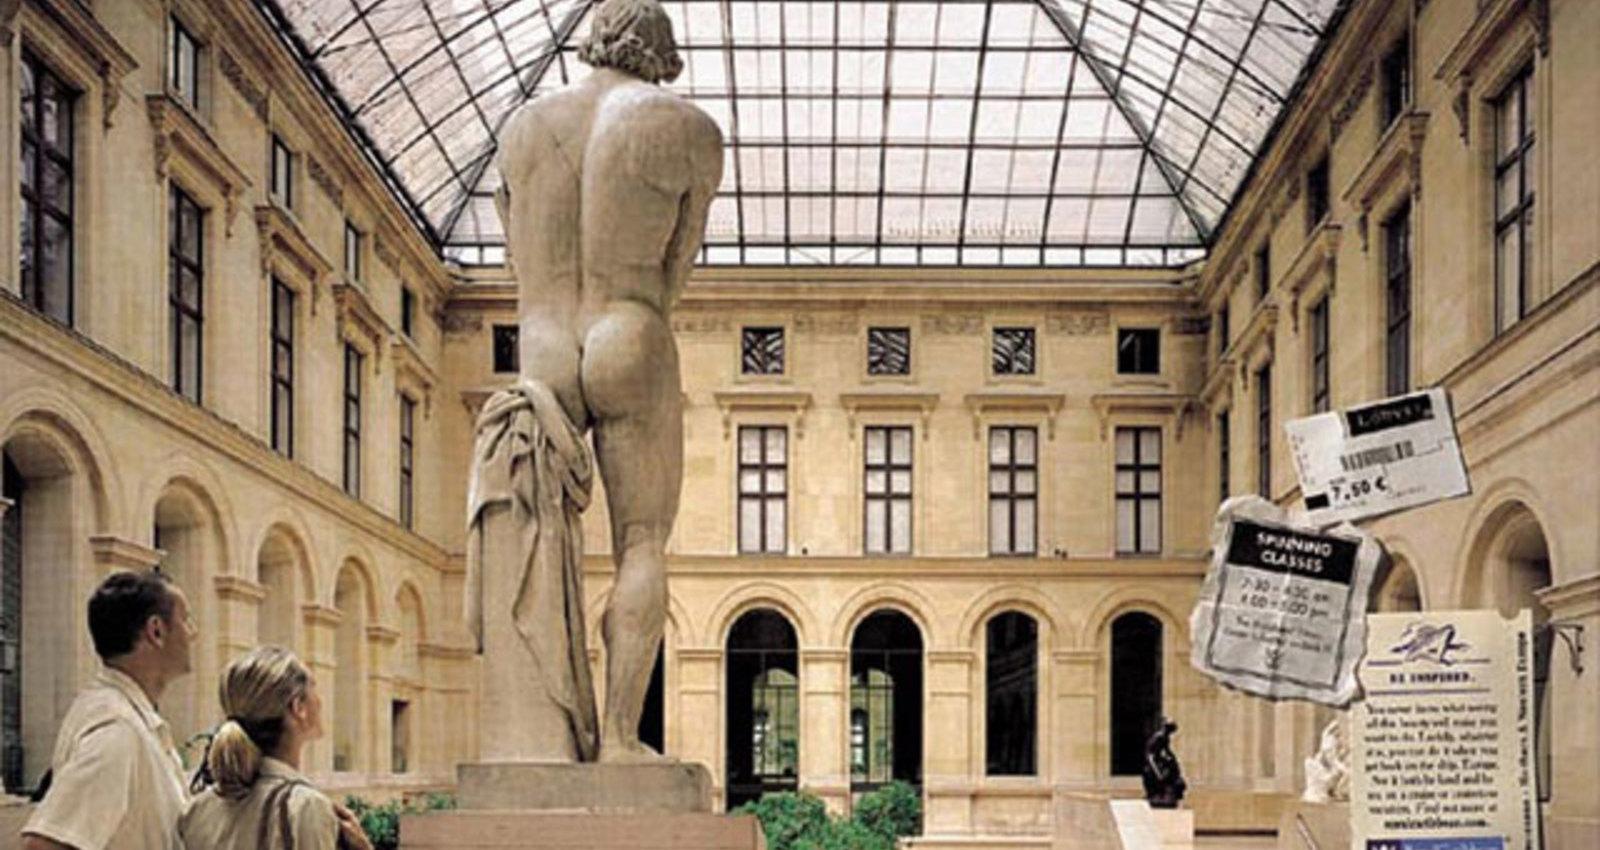 Sistine Chapel, Louvre, Ireland